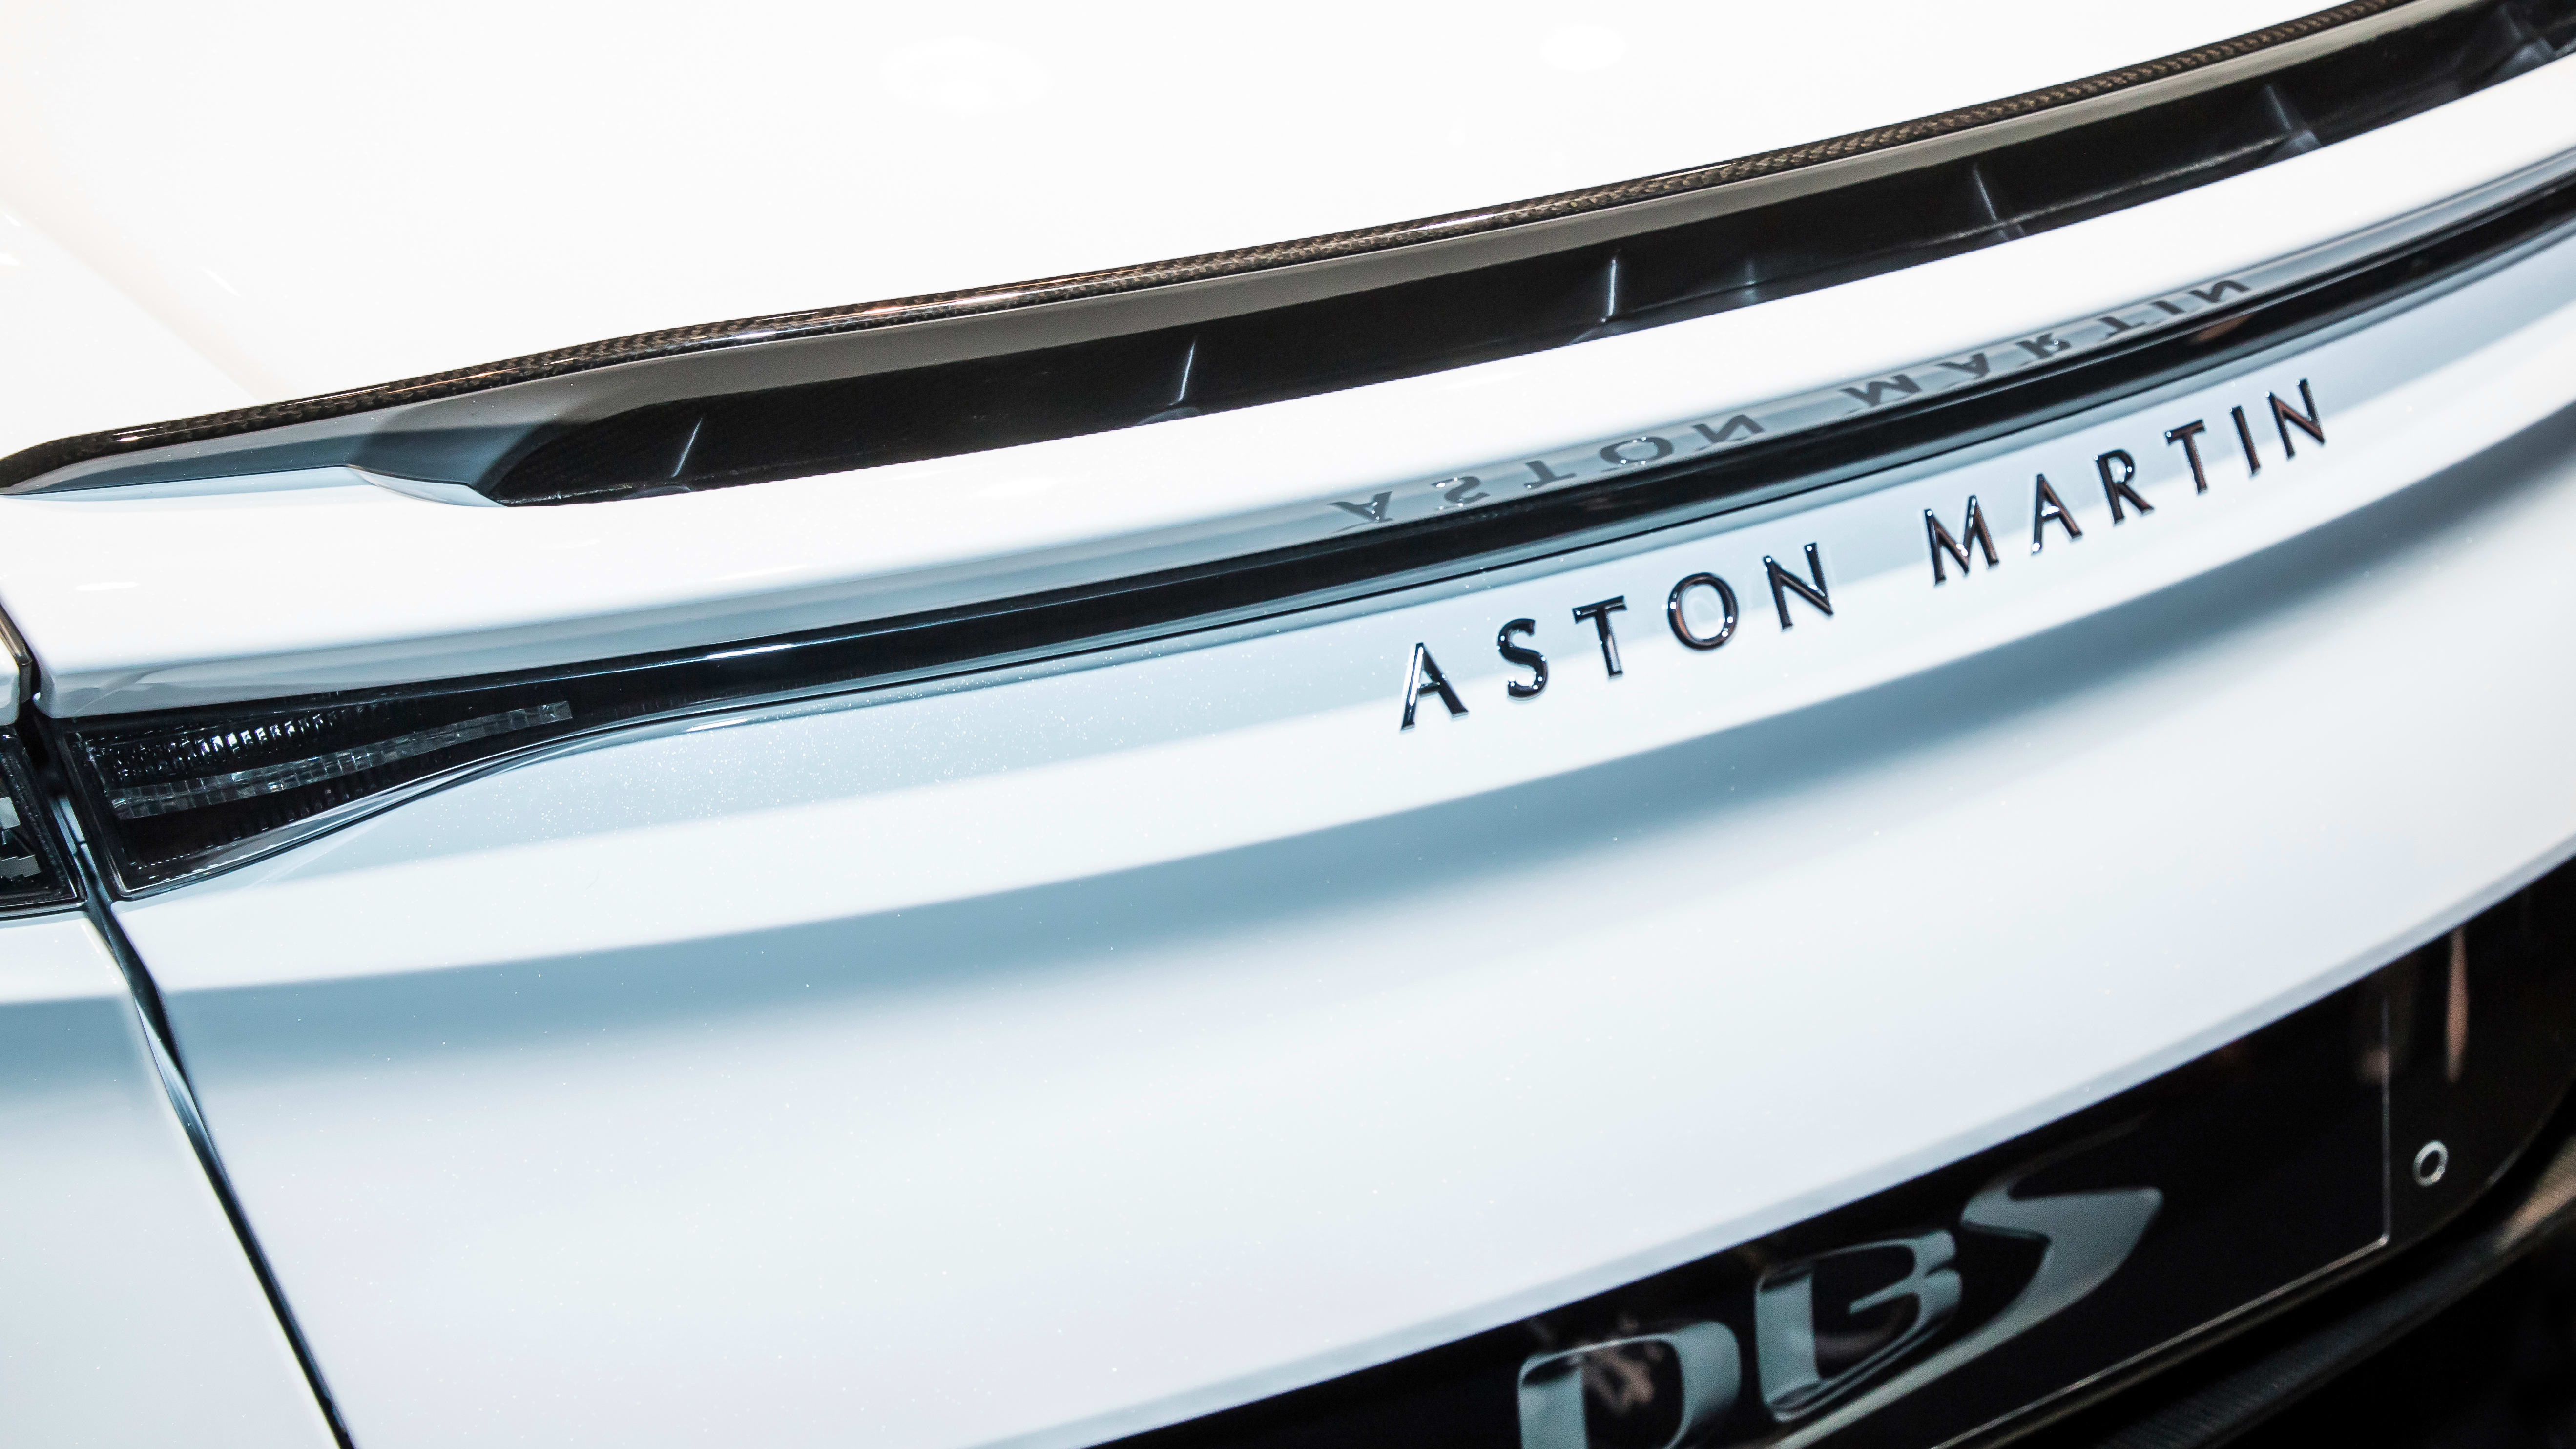 Aston Martin DBS Superleggera Sydney 12